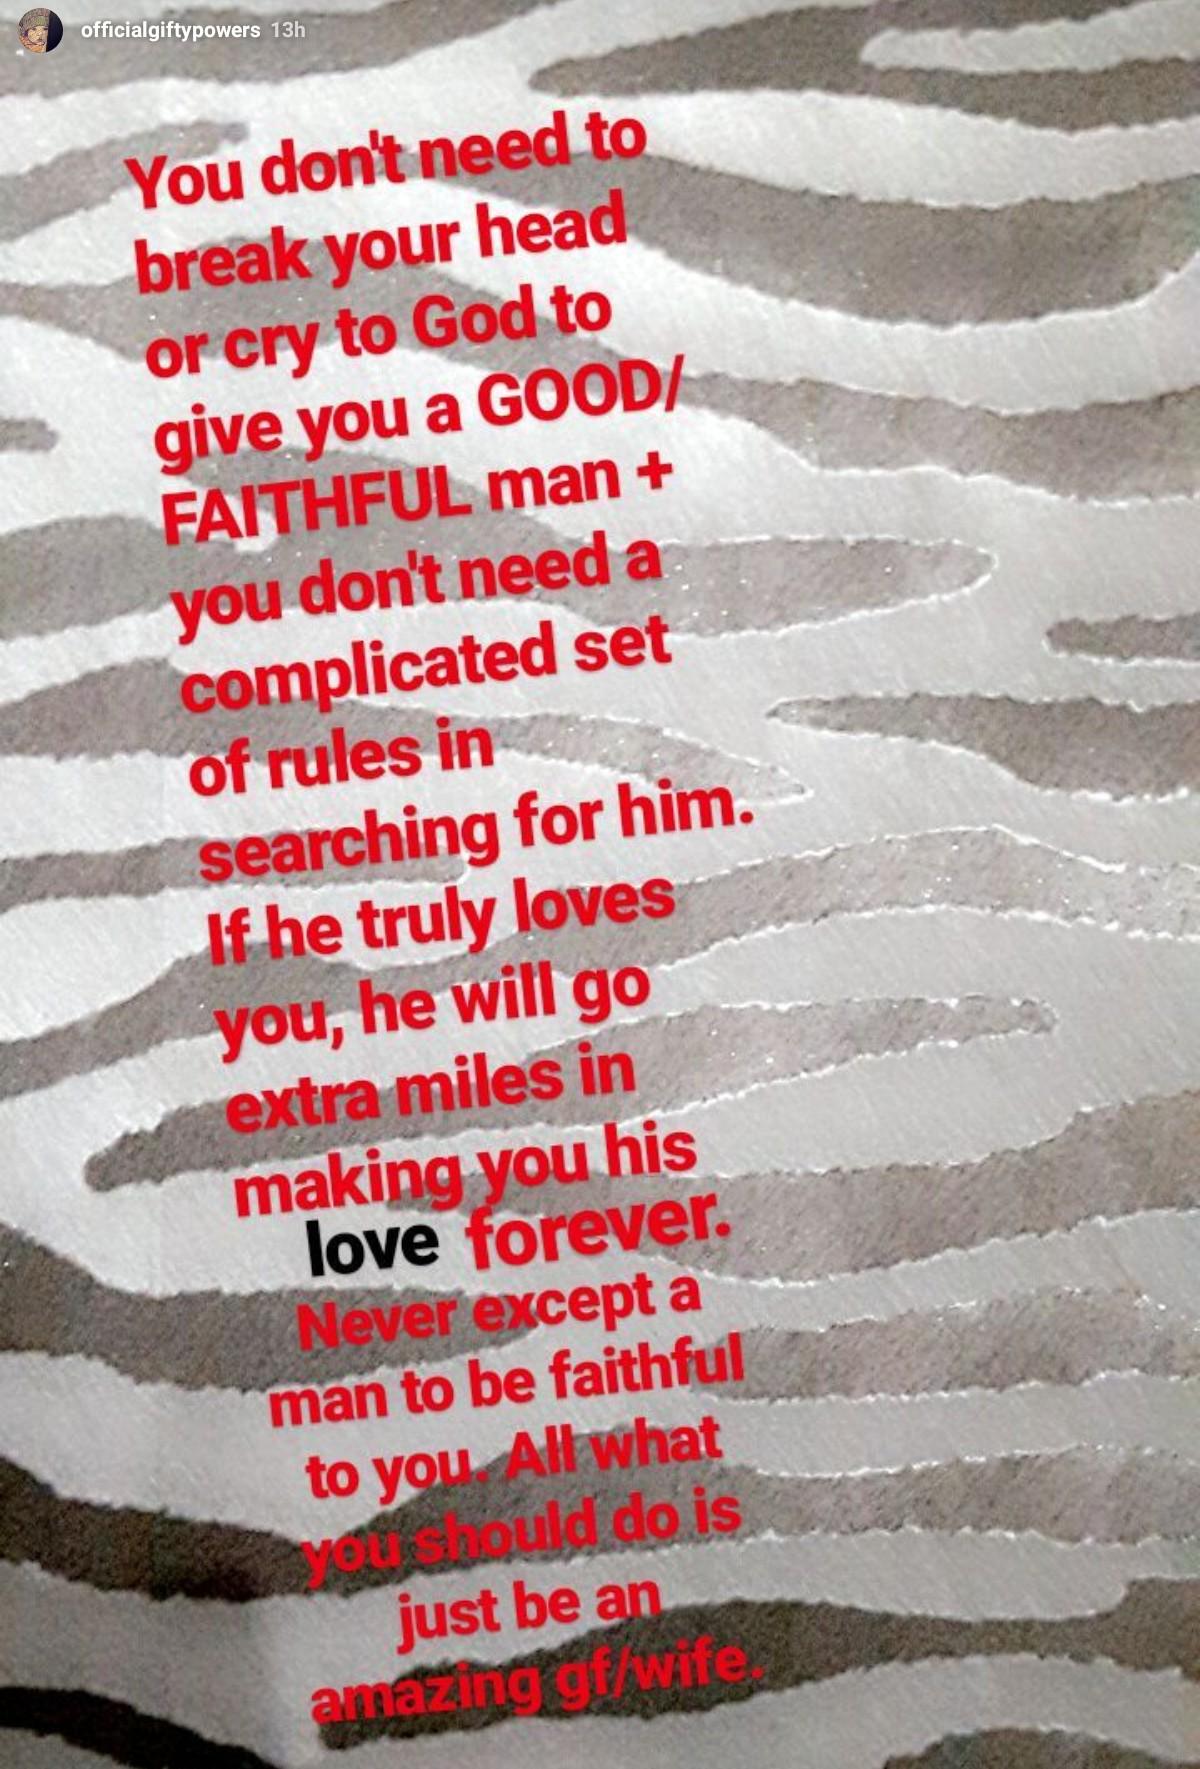 Gifty Powers Relationship Advice For Good/Faithful Man (2)